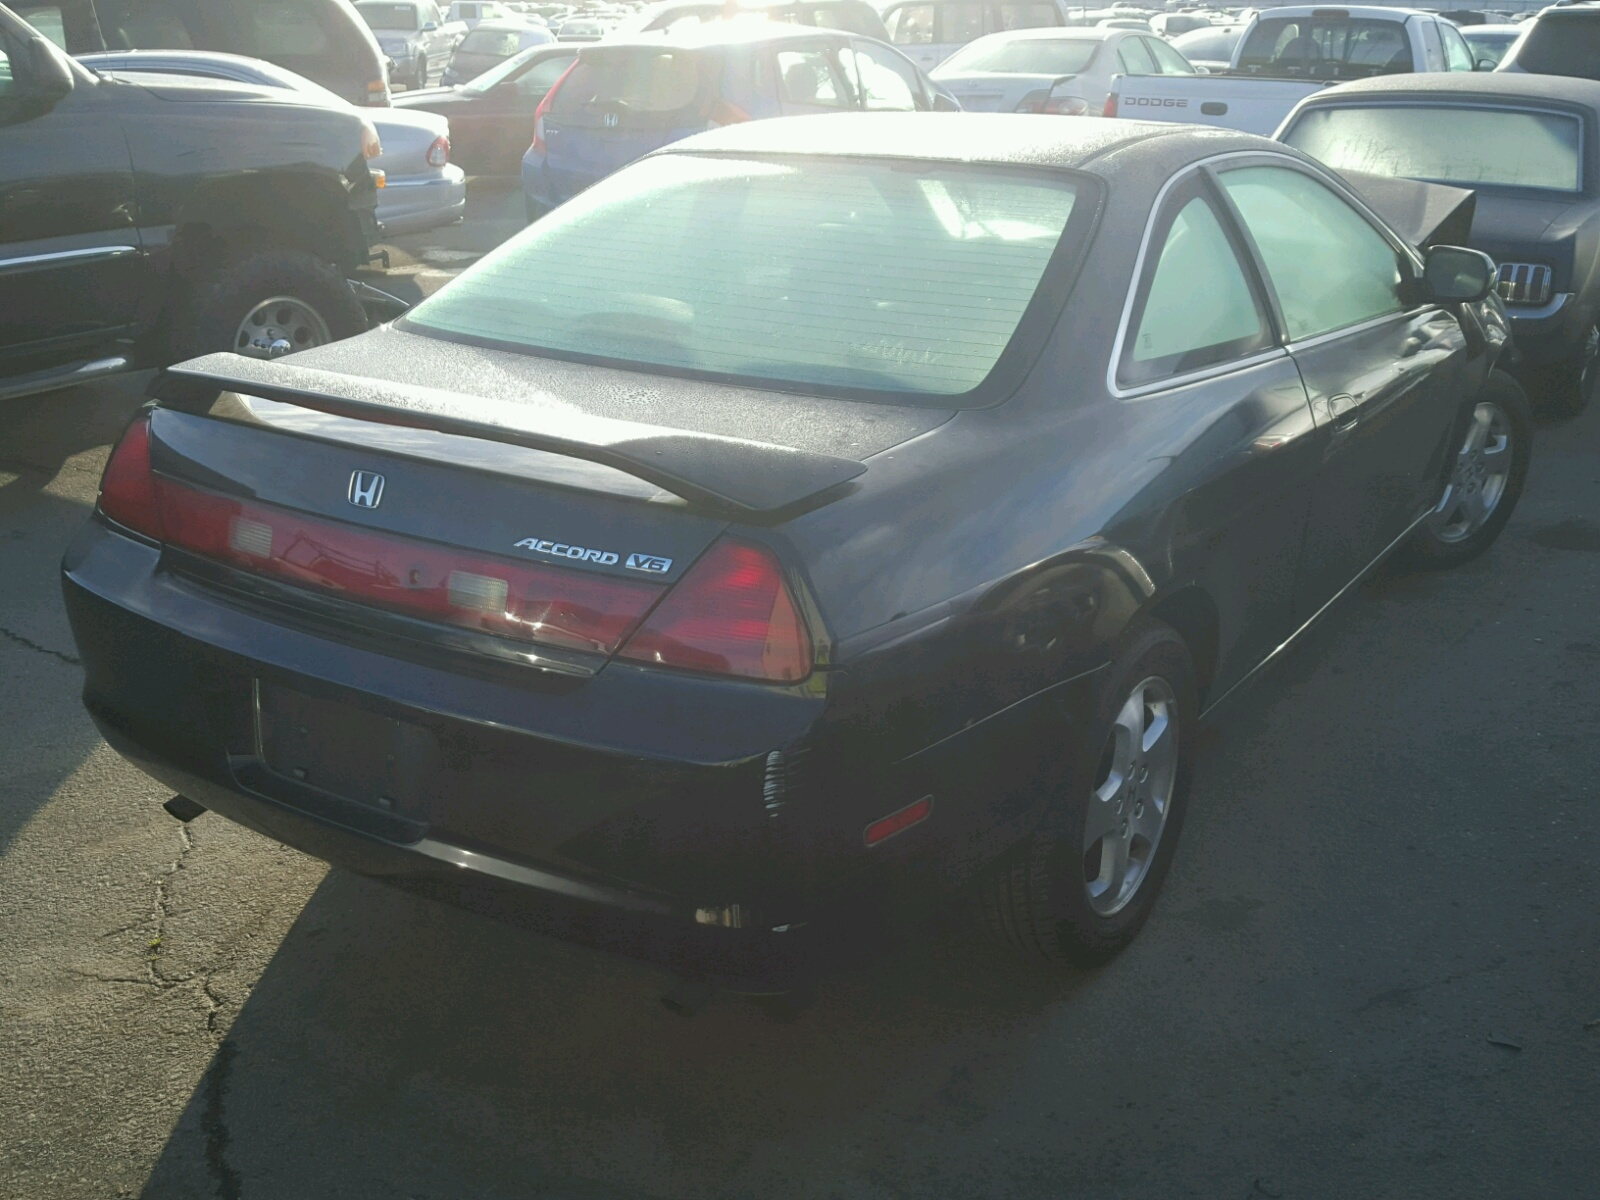 1999 Honda Accord Ex Front End Damage 1hgcg2259xa016068 Sold Coupe V6 4